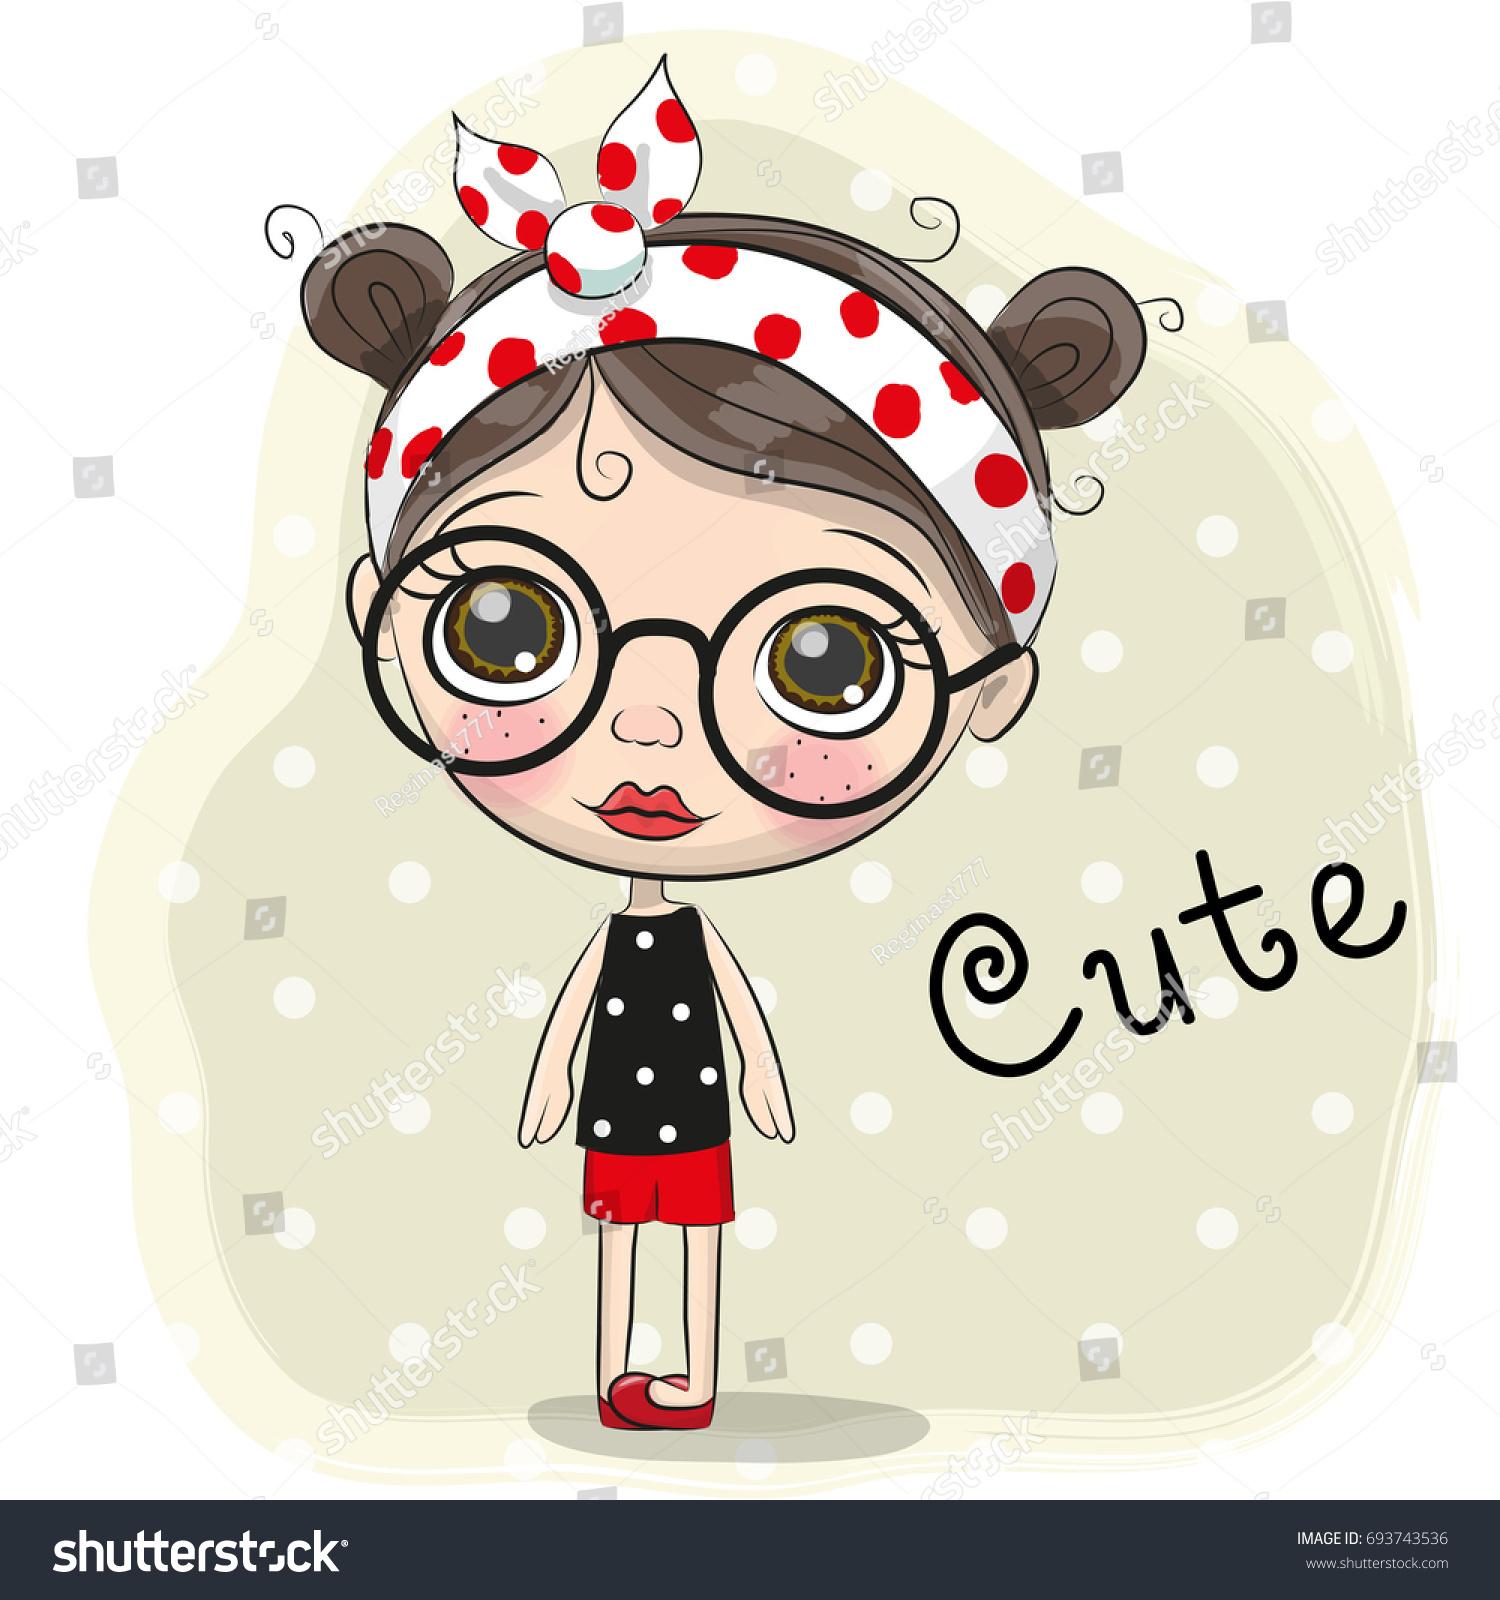 cute cartoon girl big glasses stock vector hd (royalty free